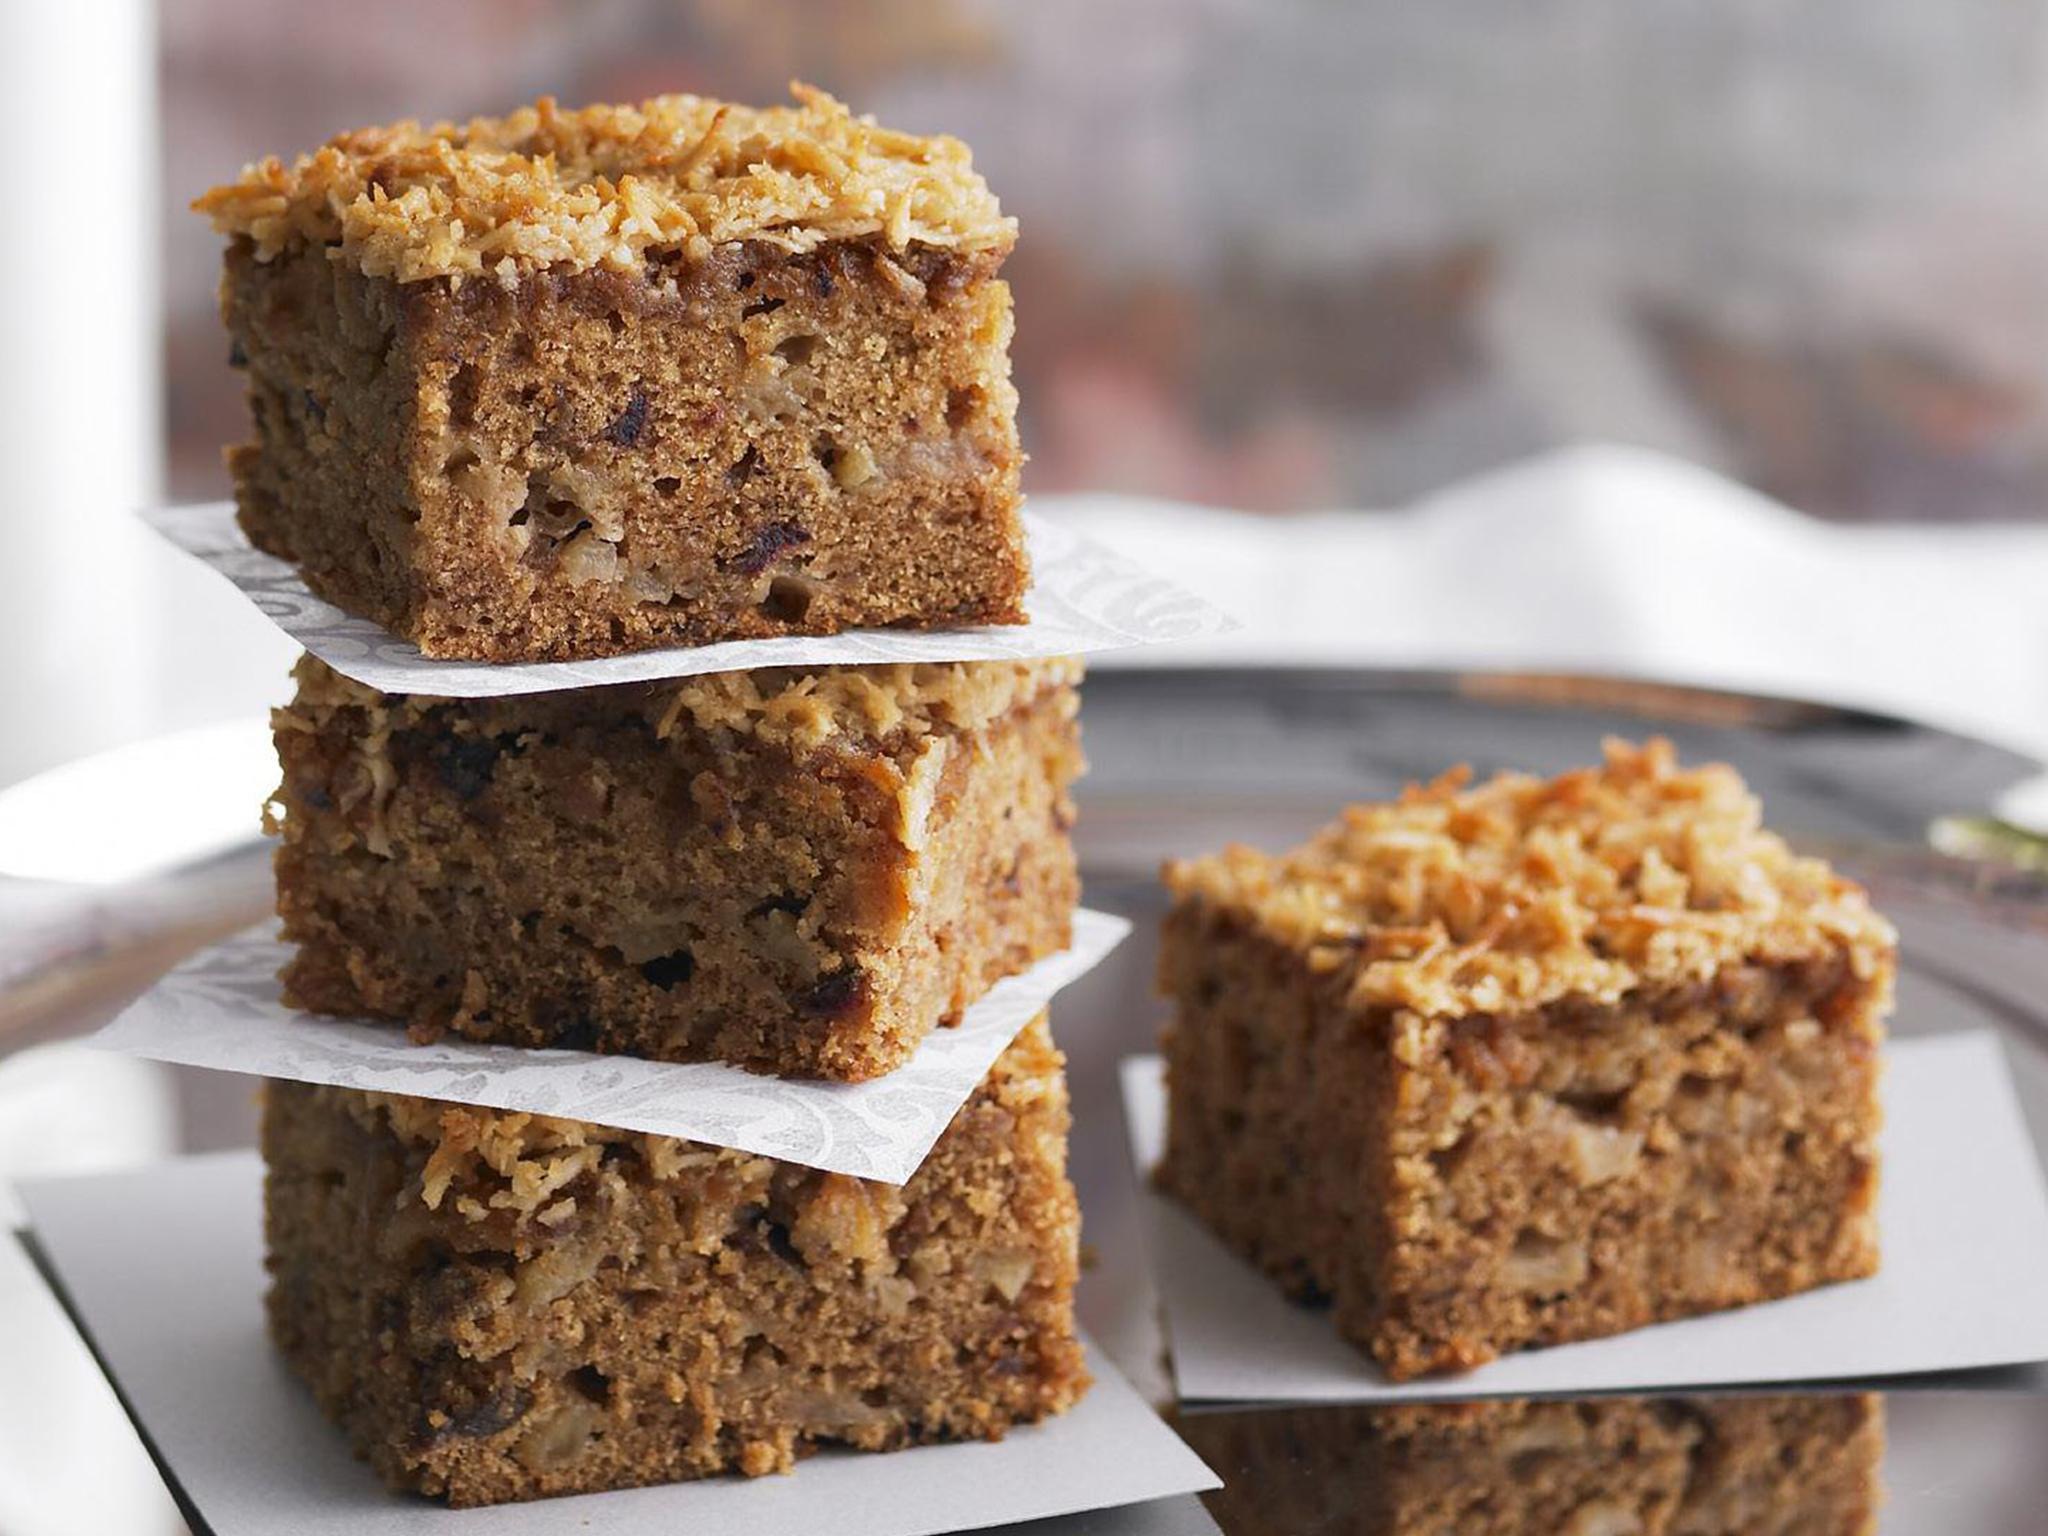 Lumberjack cake recipe australian womens weekly recipe food to love forumfinder Gallery